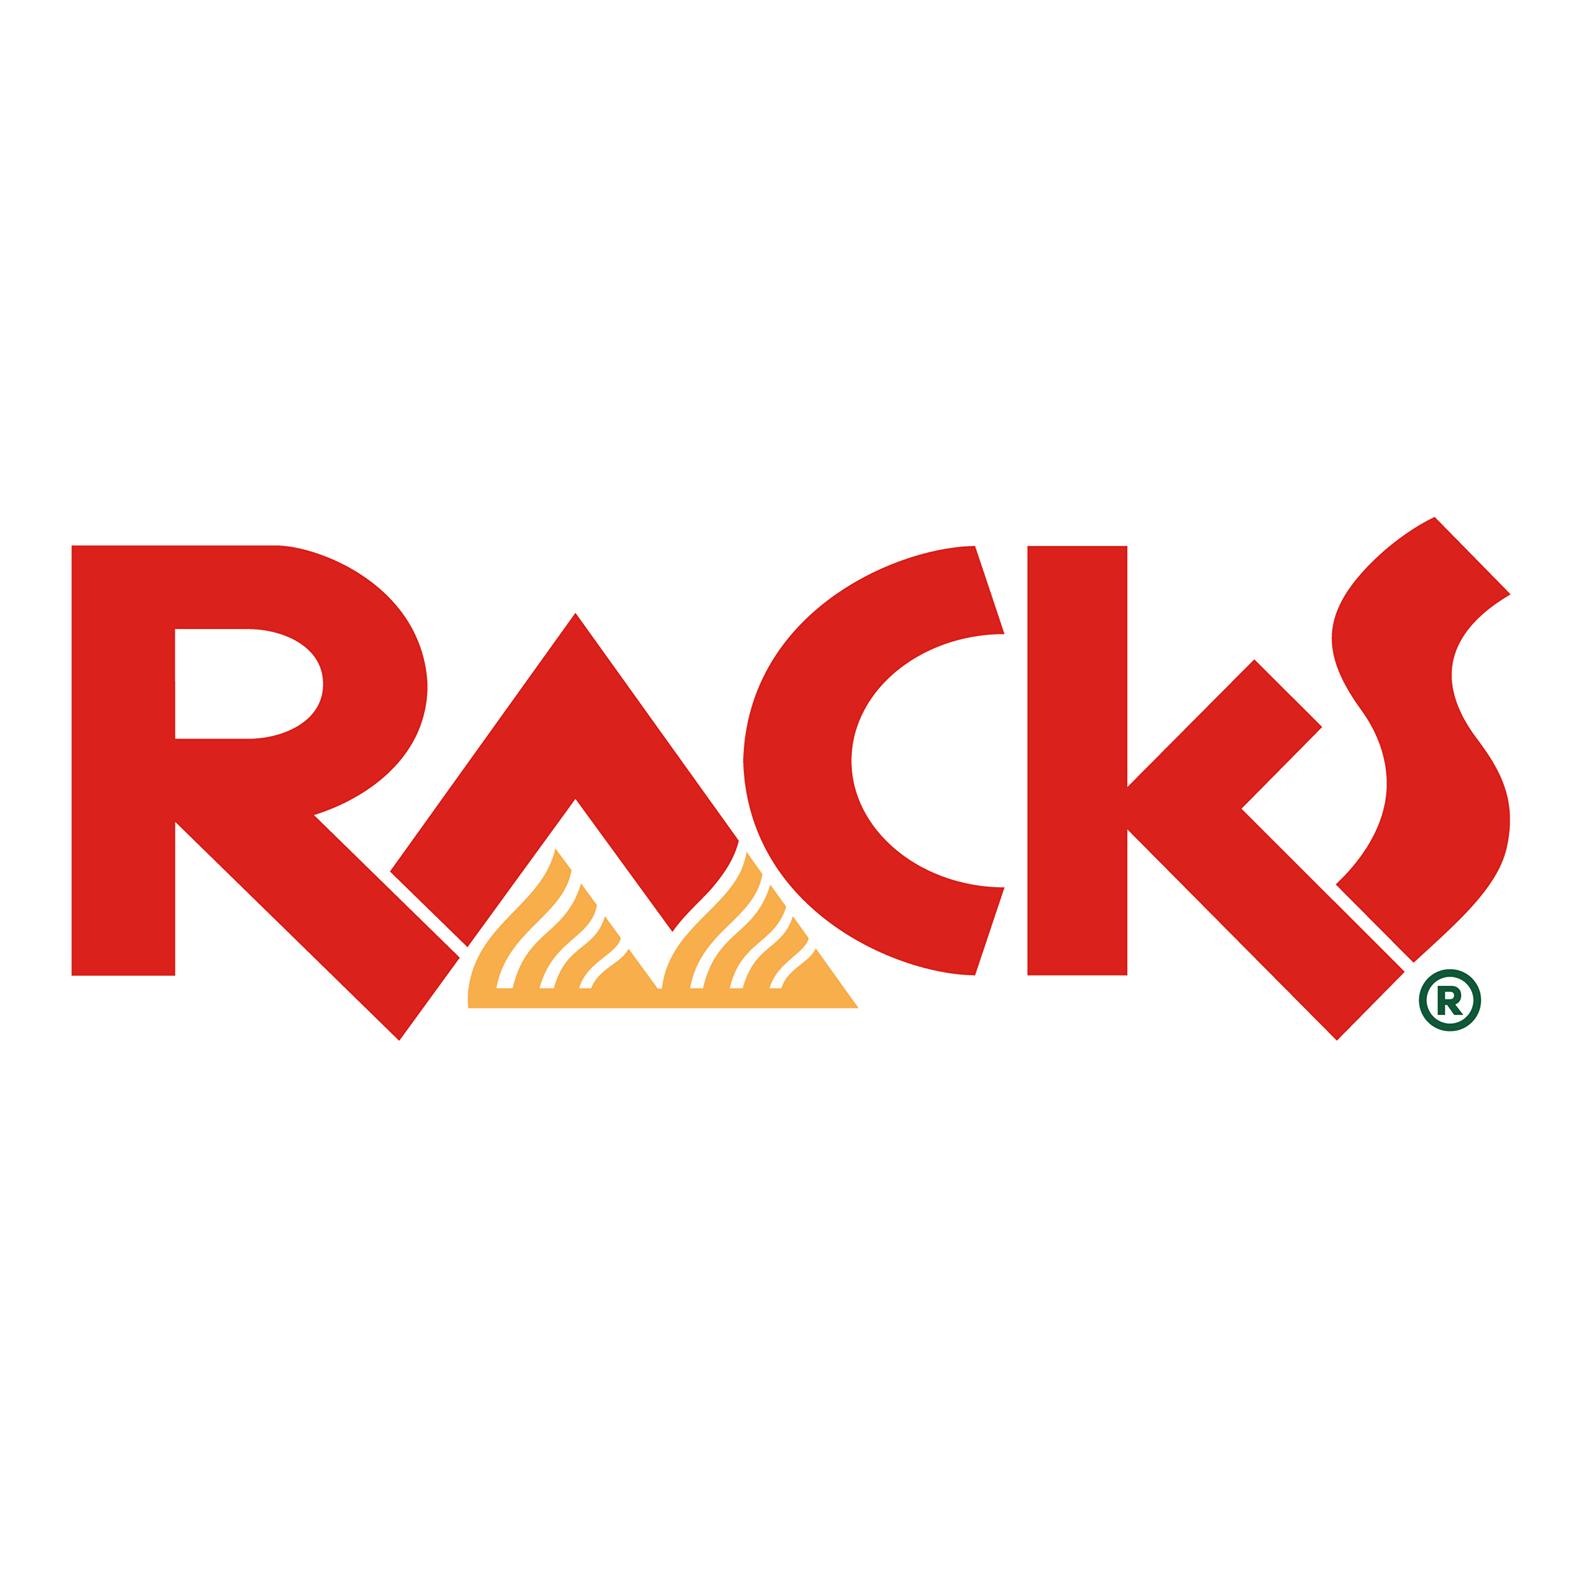 RACKS (Paseo De Sta. Rosa, Laguna) Santa Rosa City